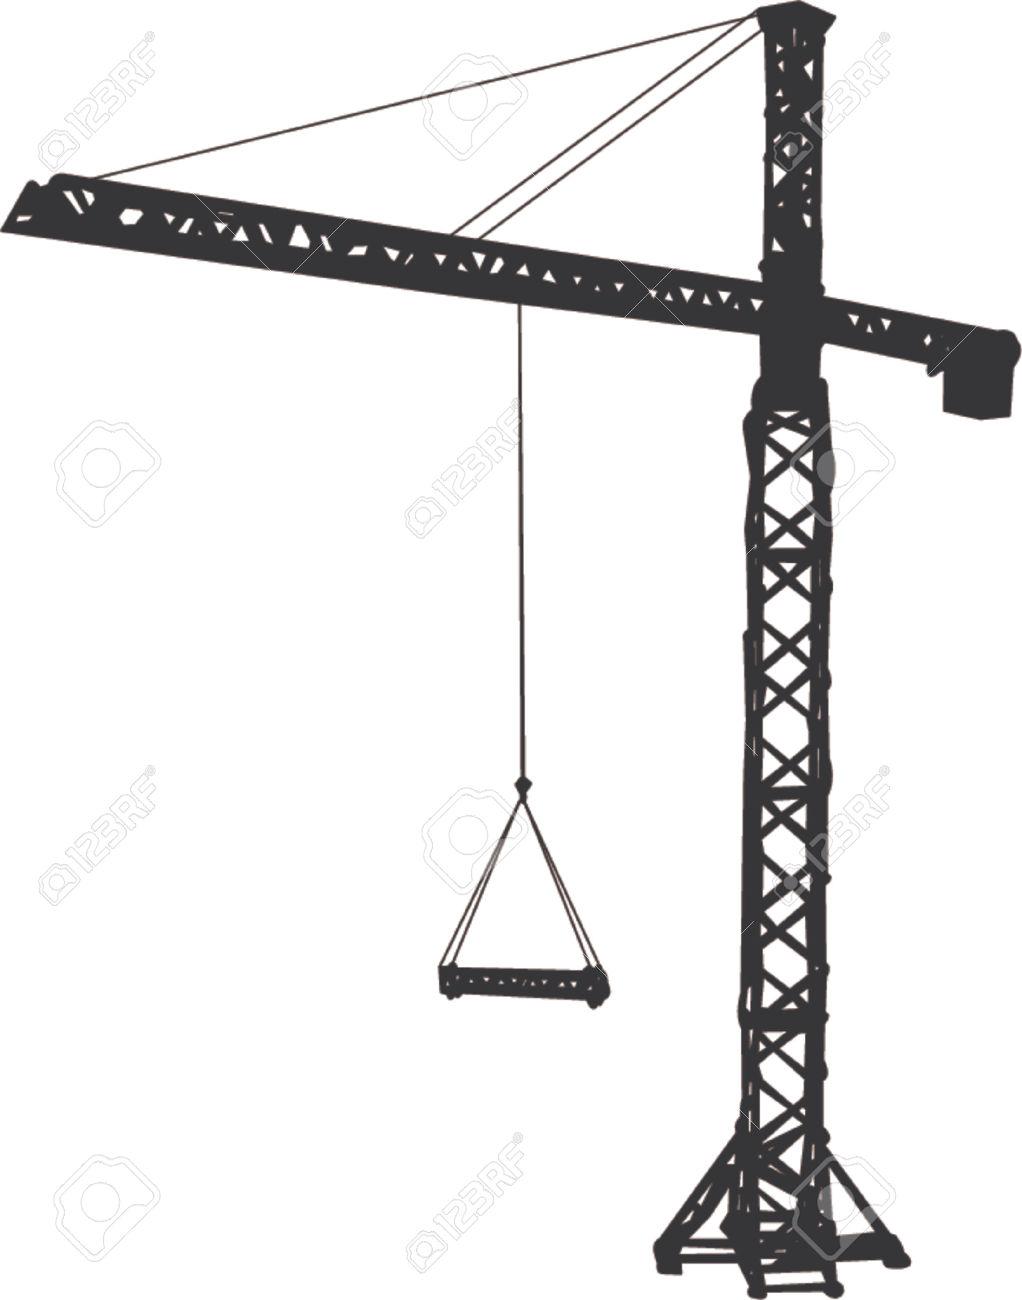 tower-crane clipart Stock Vector - 665553